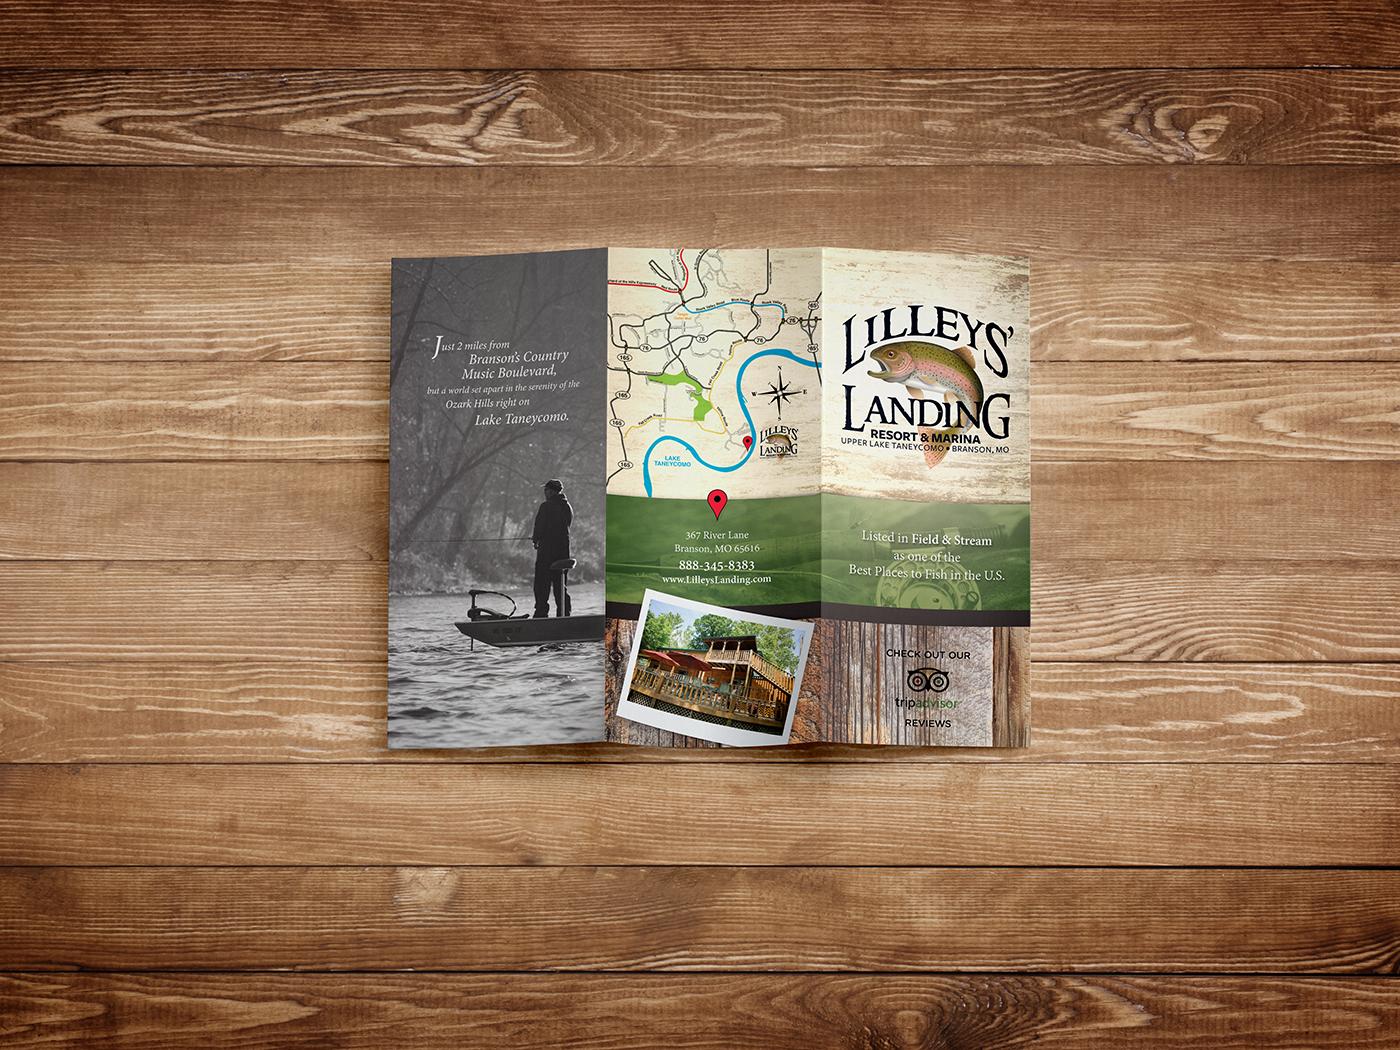 Lilleys' Landing brochure outside